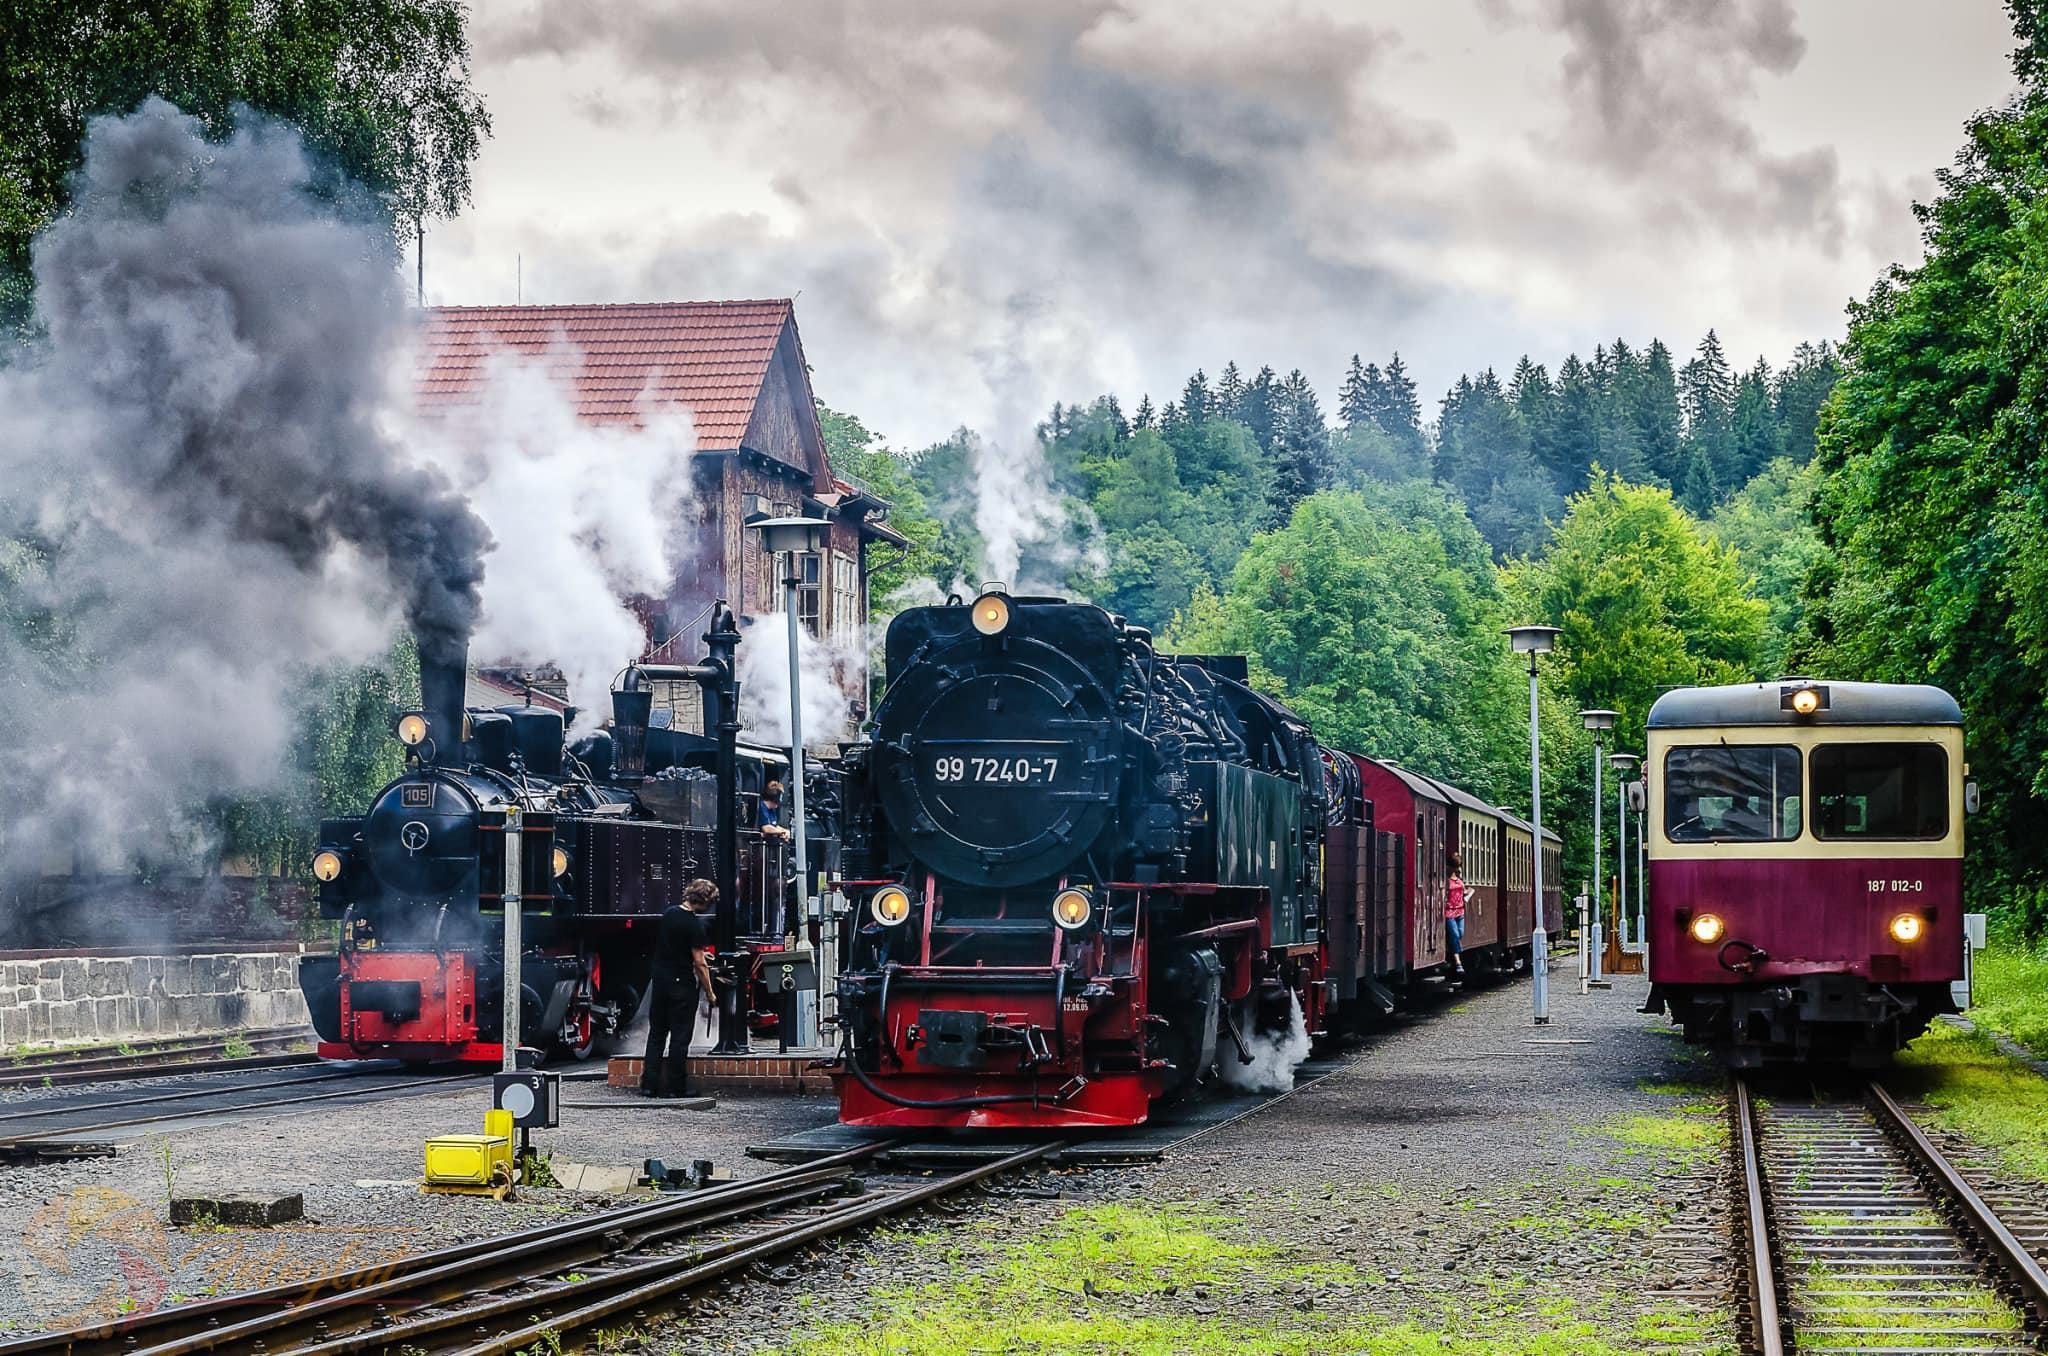 Dampf im Bahnhof - © FotoGlut - Michael Stollmann